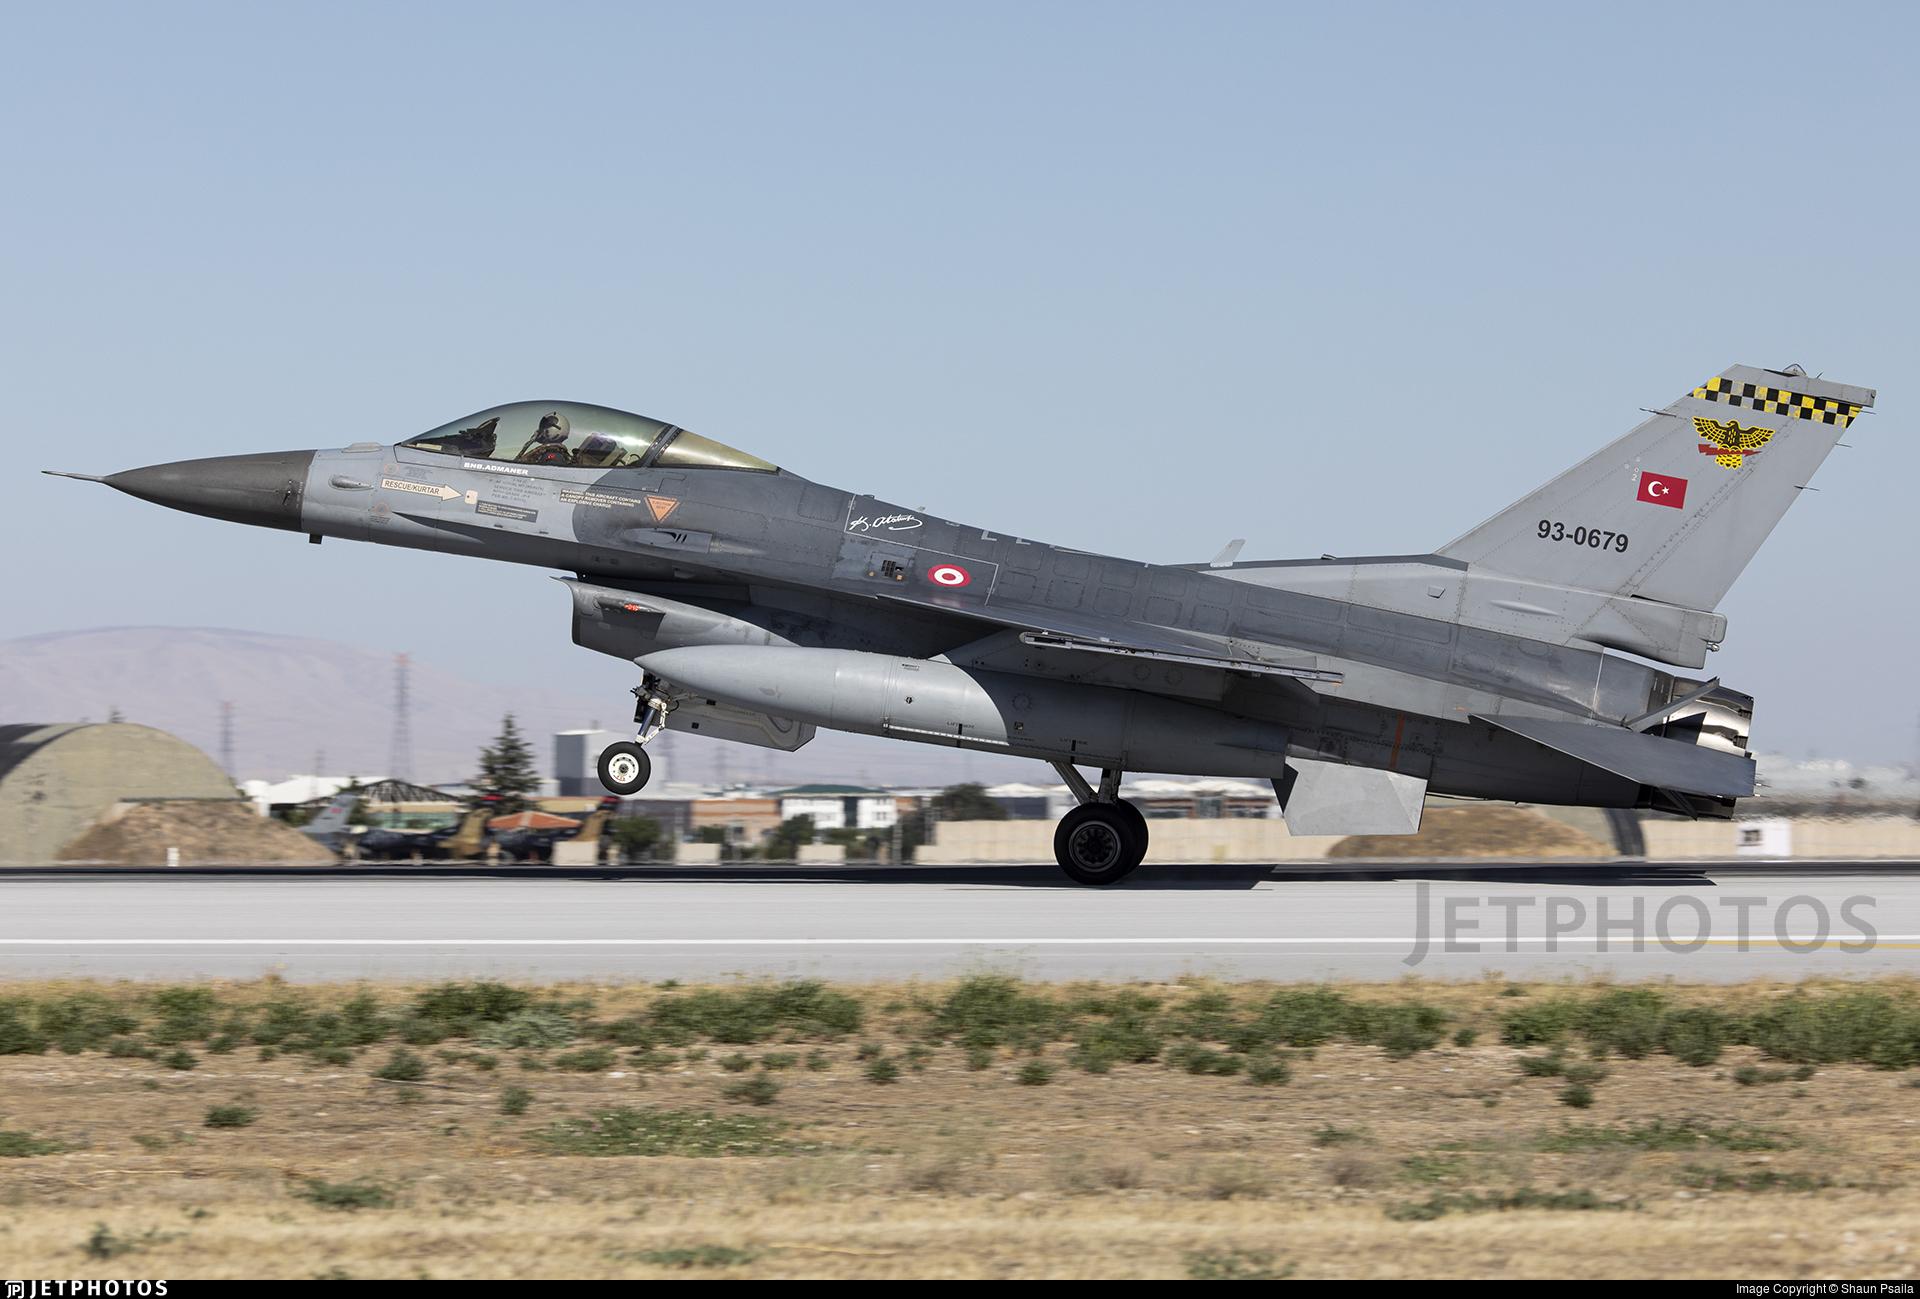 93-0679 - Lockheed Martin F-16C Fighting Falcon - Turkey - Air Force